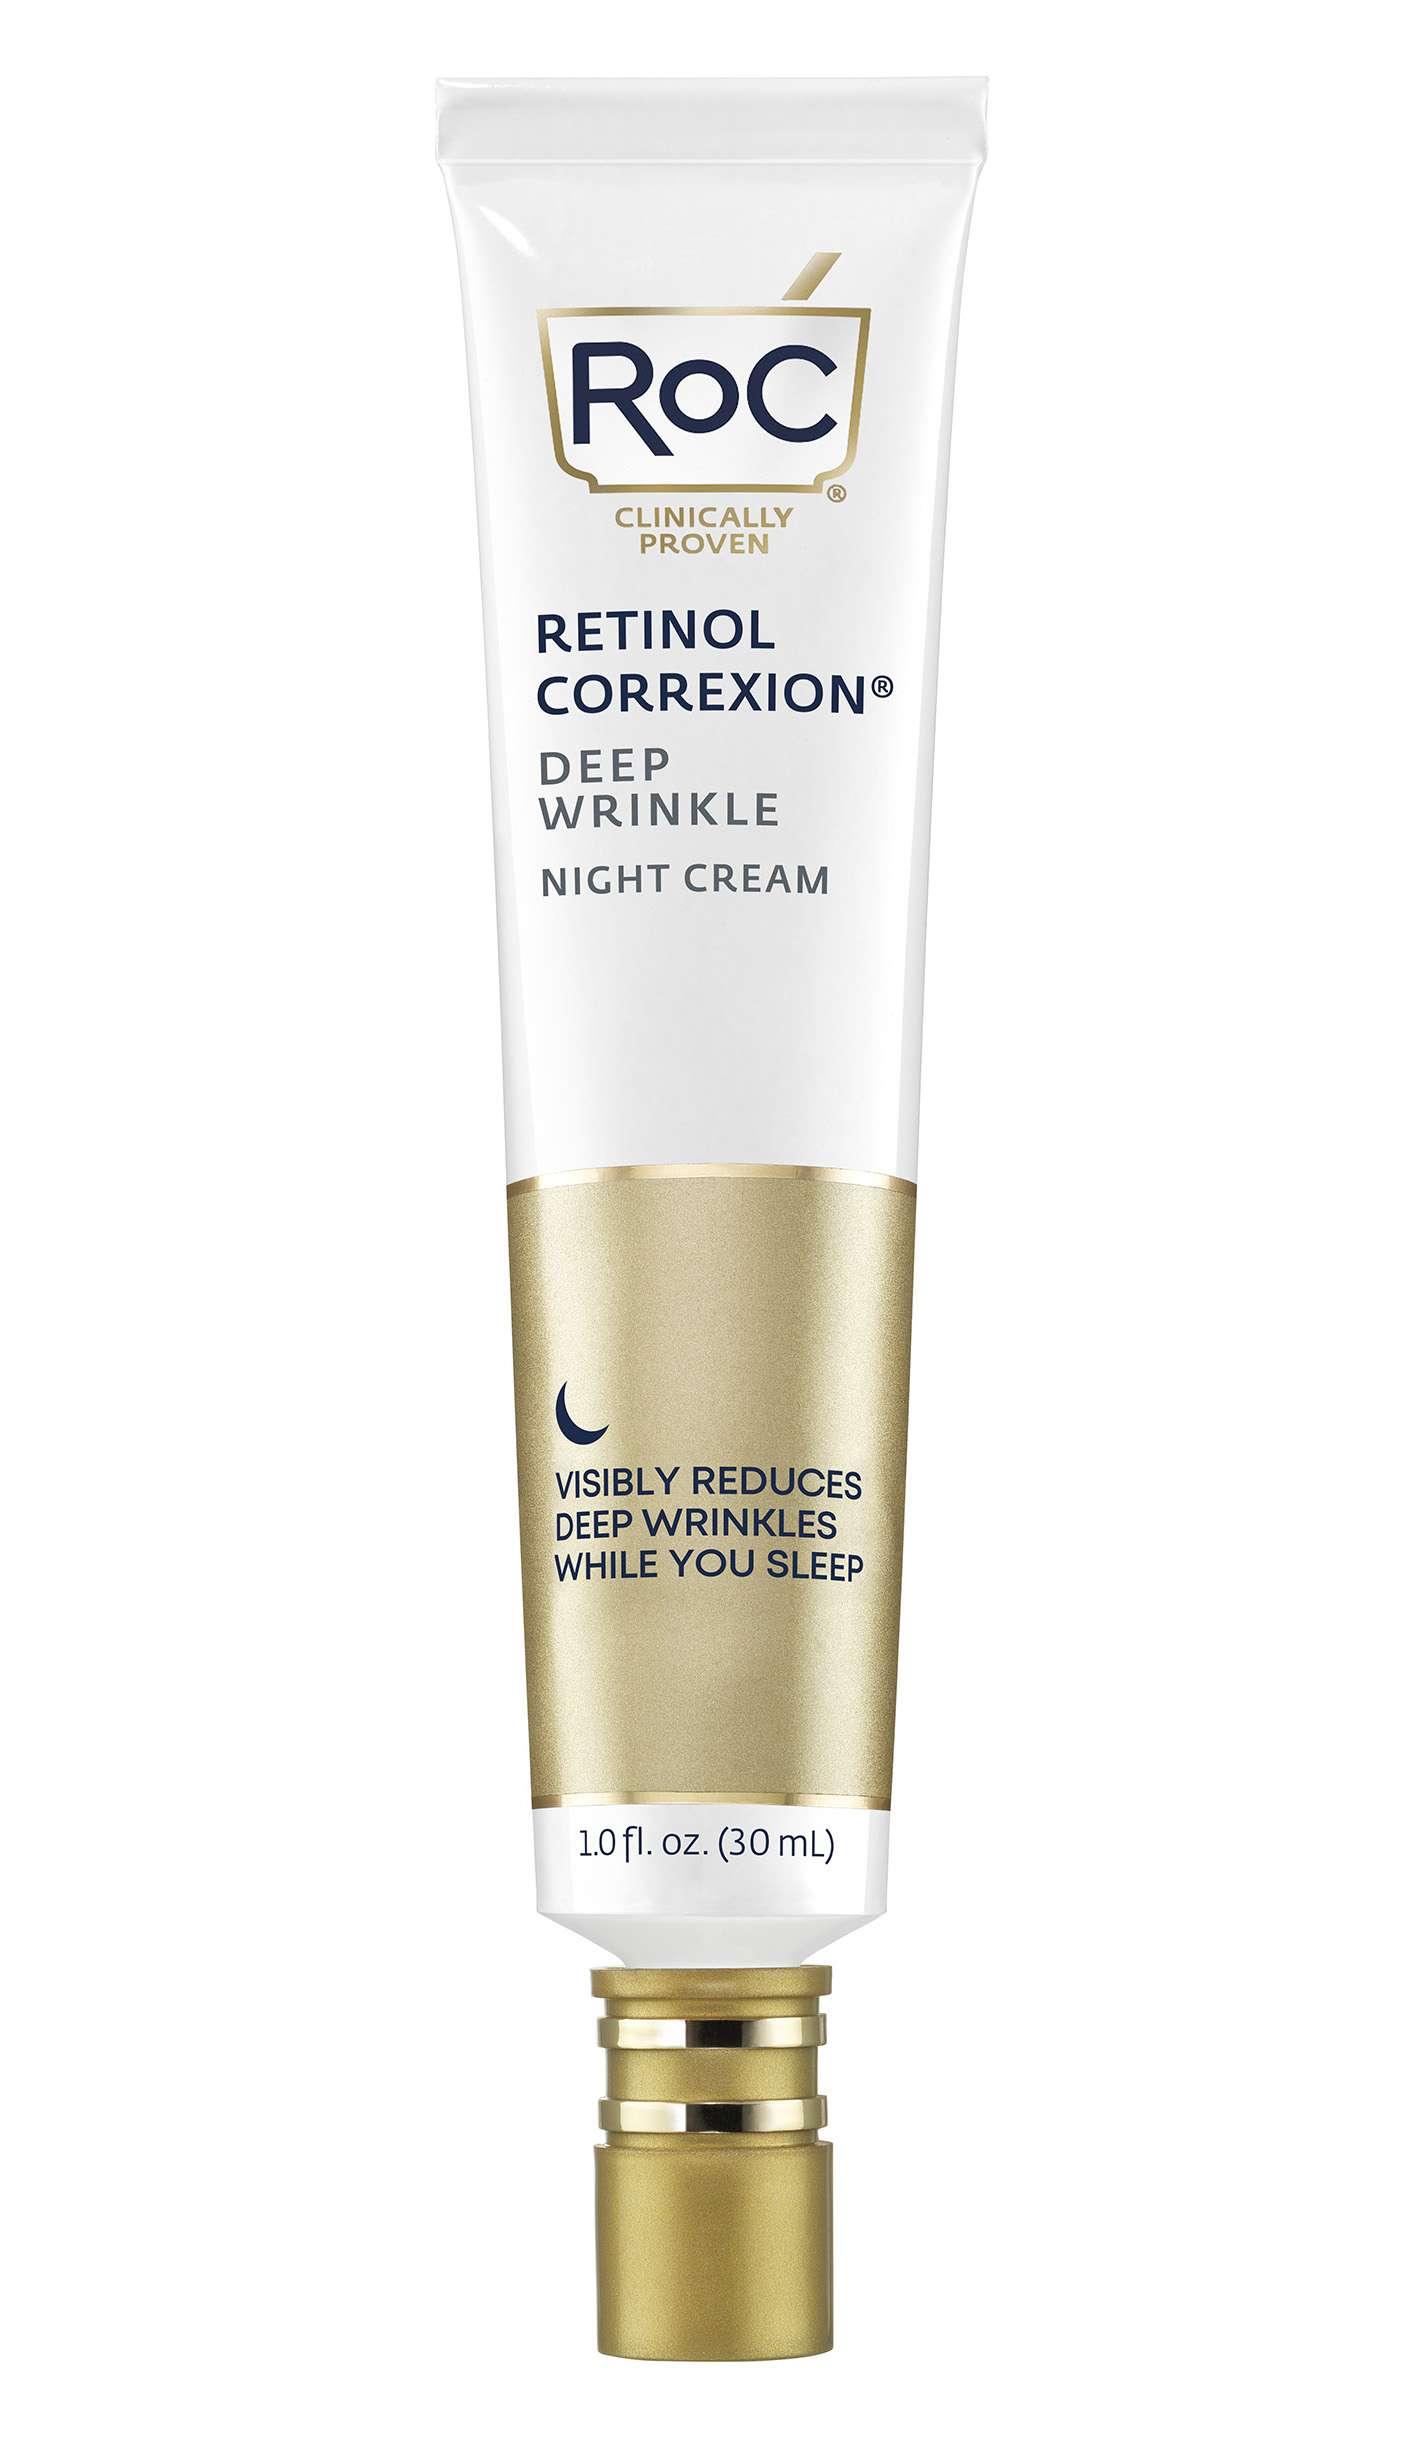 roc retinol